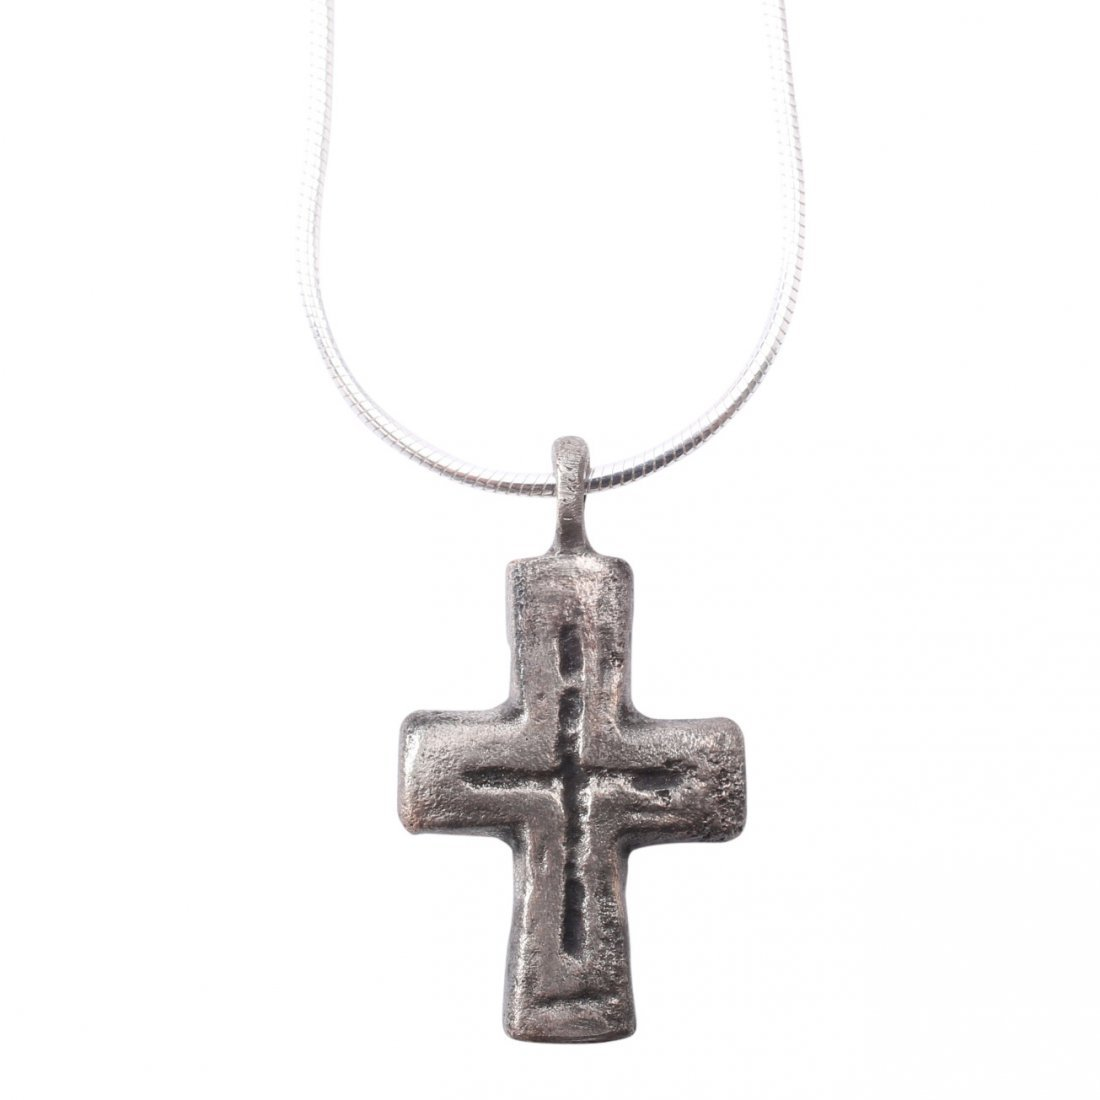 Byzantine Pilgrim's Reliquary Cross 5-8th C